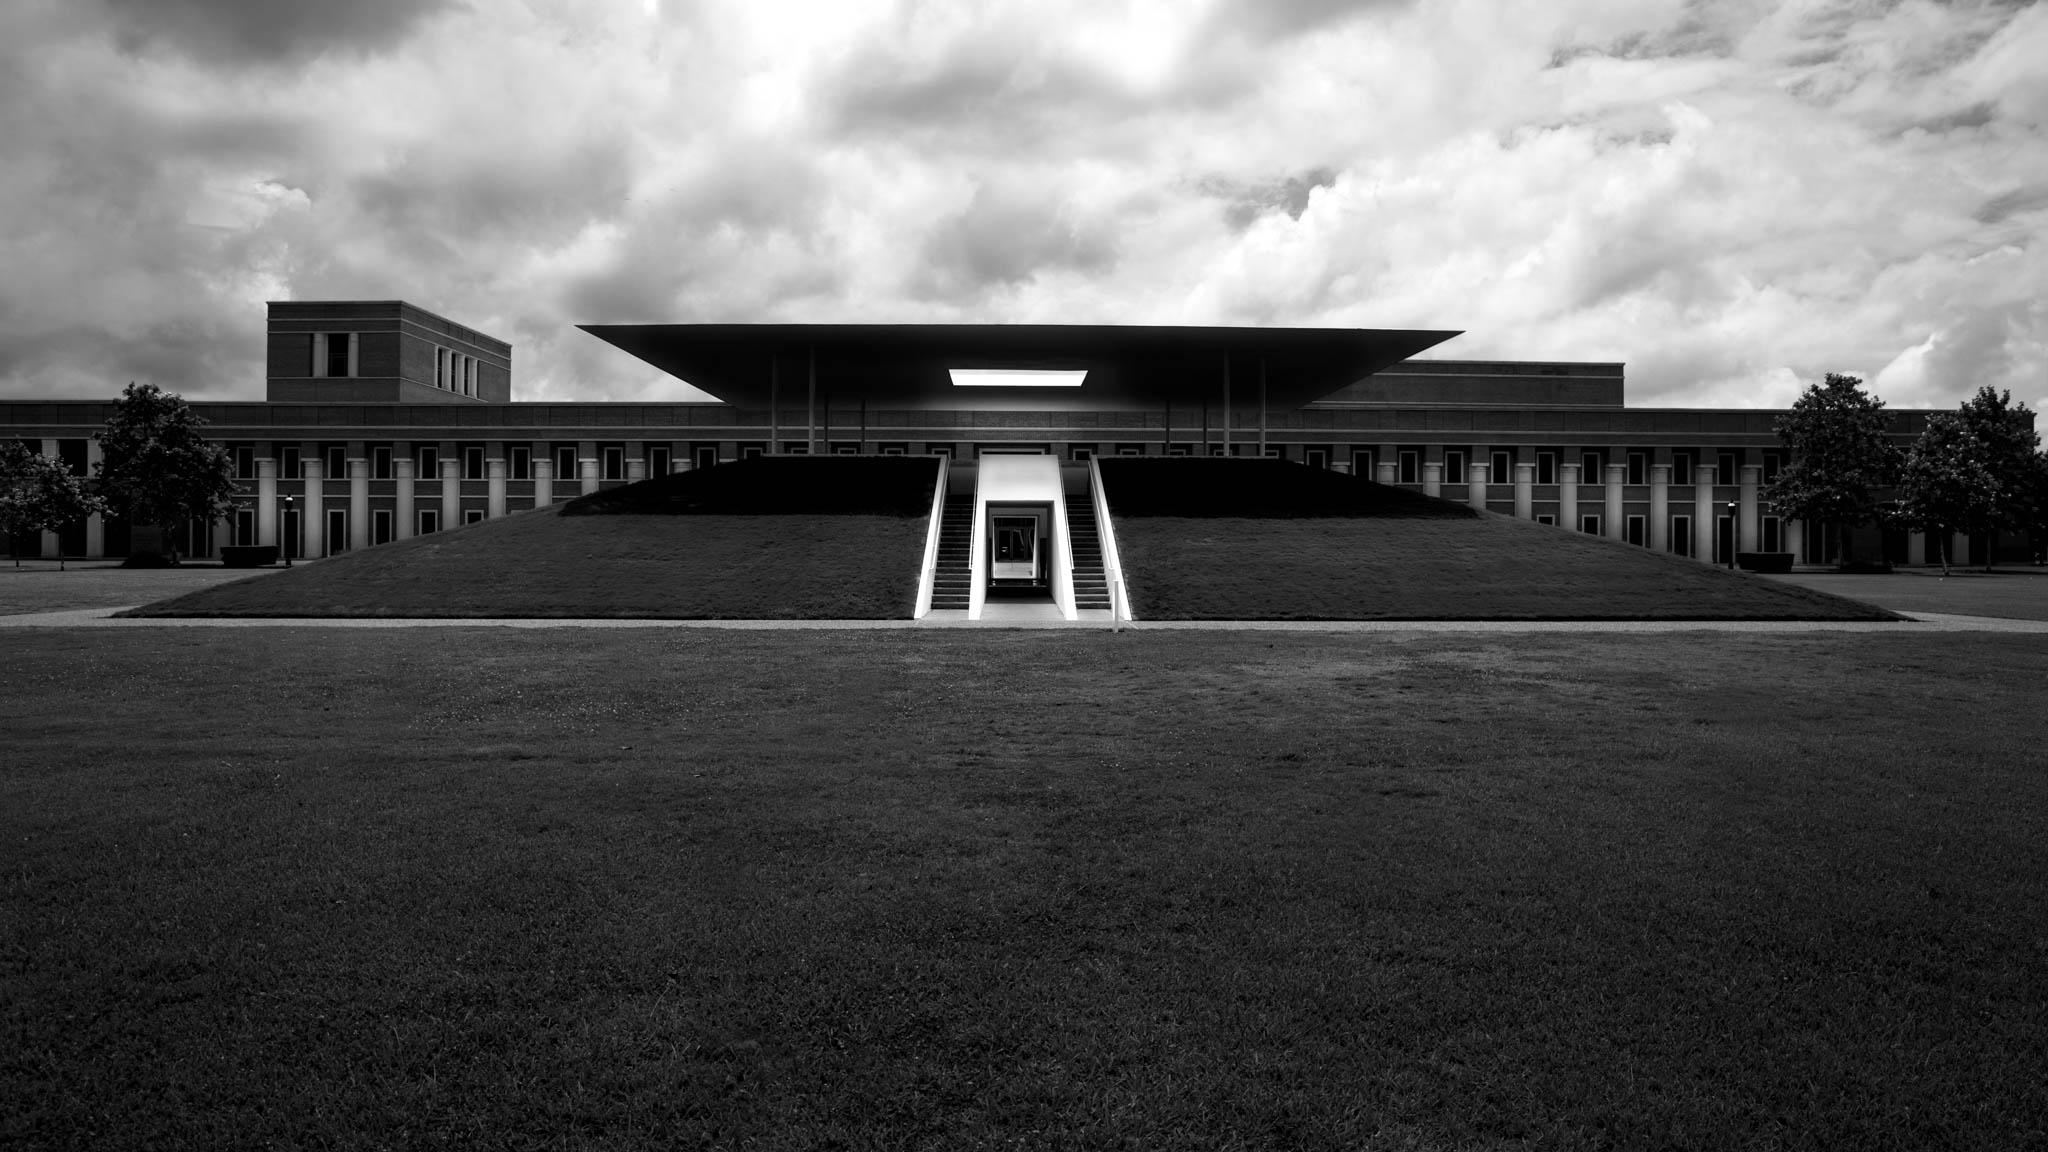 James Turrell's Skyspace Houston